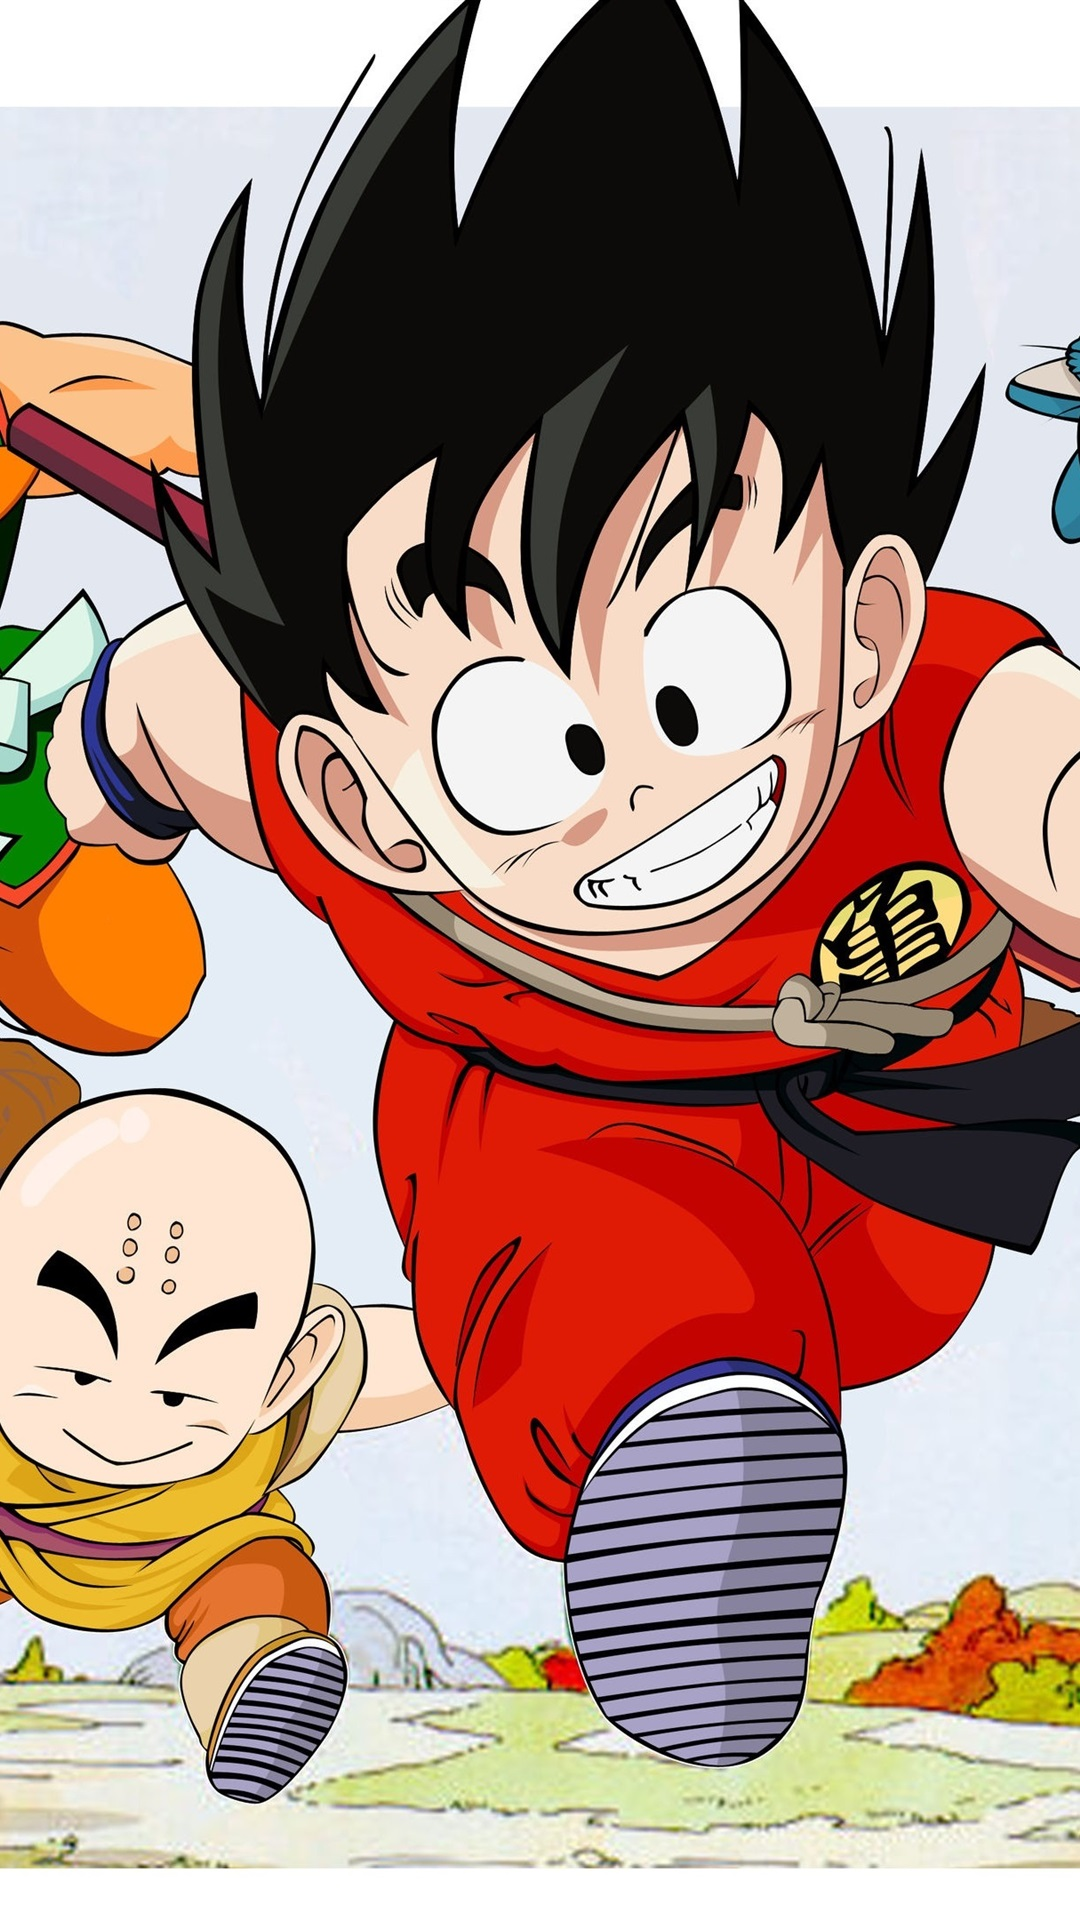 Dragon Ball Klassische Anime 1080x1920 Iphone 8766s Plus